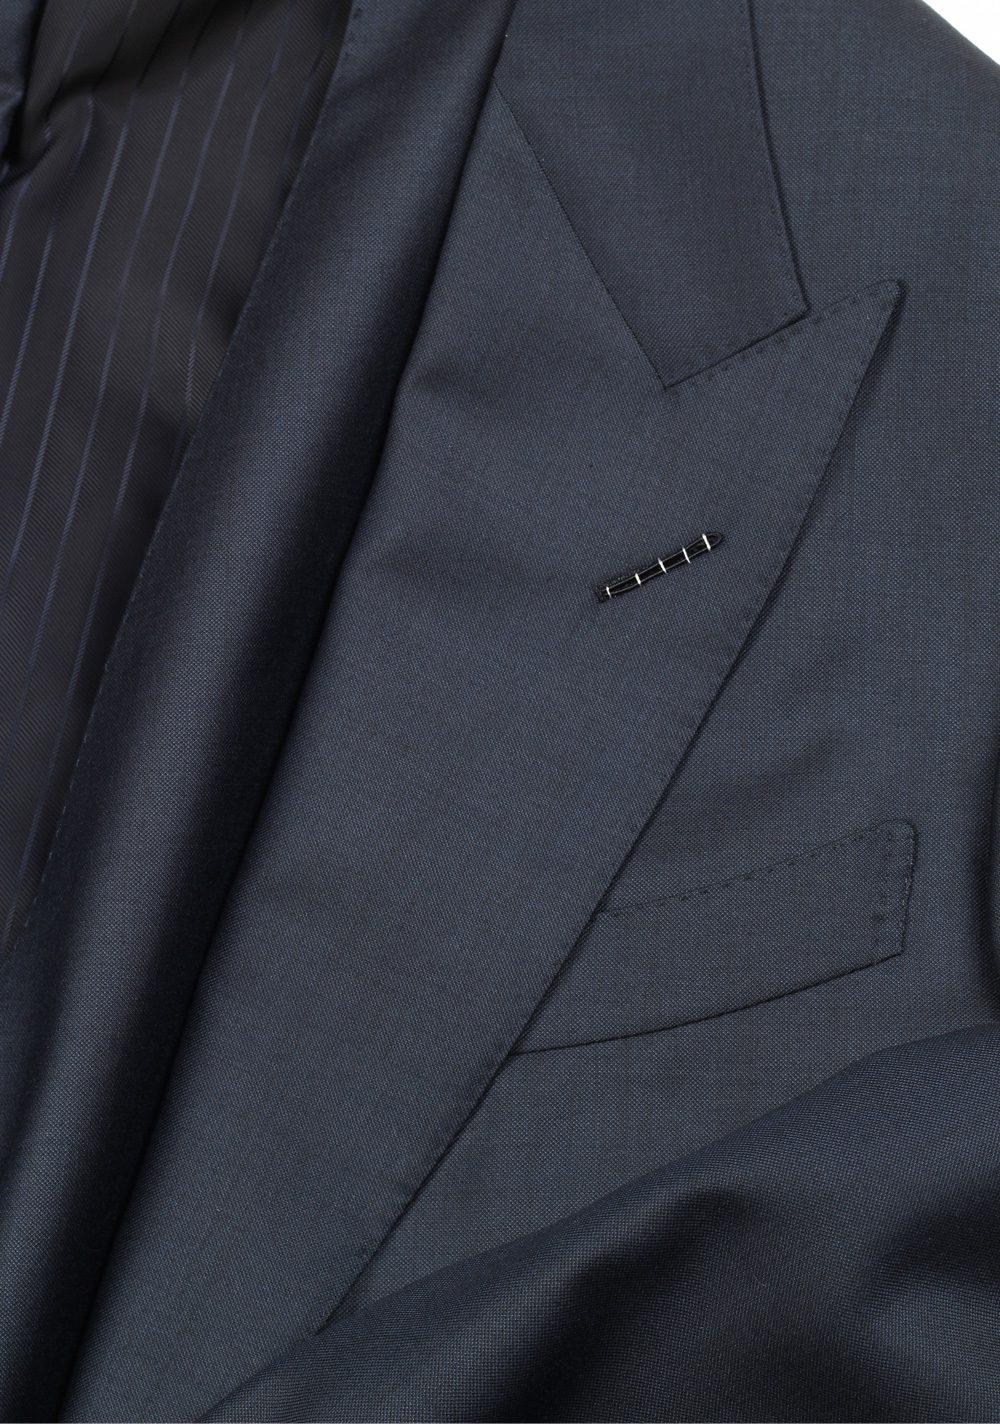 TOM FORD Windsor Blue 3 Piece Suit Size 50 / 40R U.S. Wool Fit A | Costume Limité